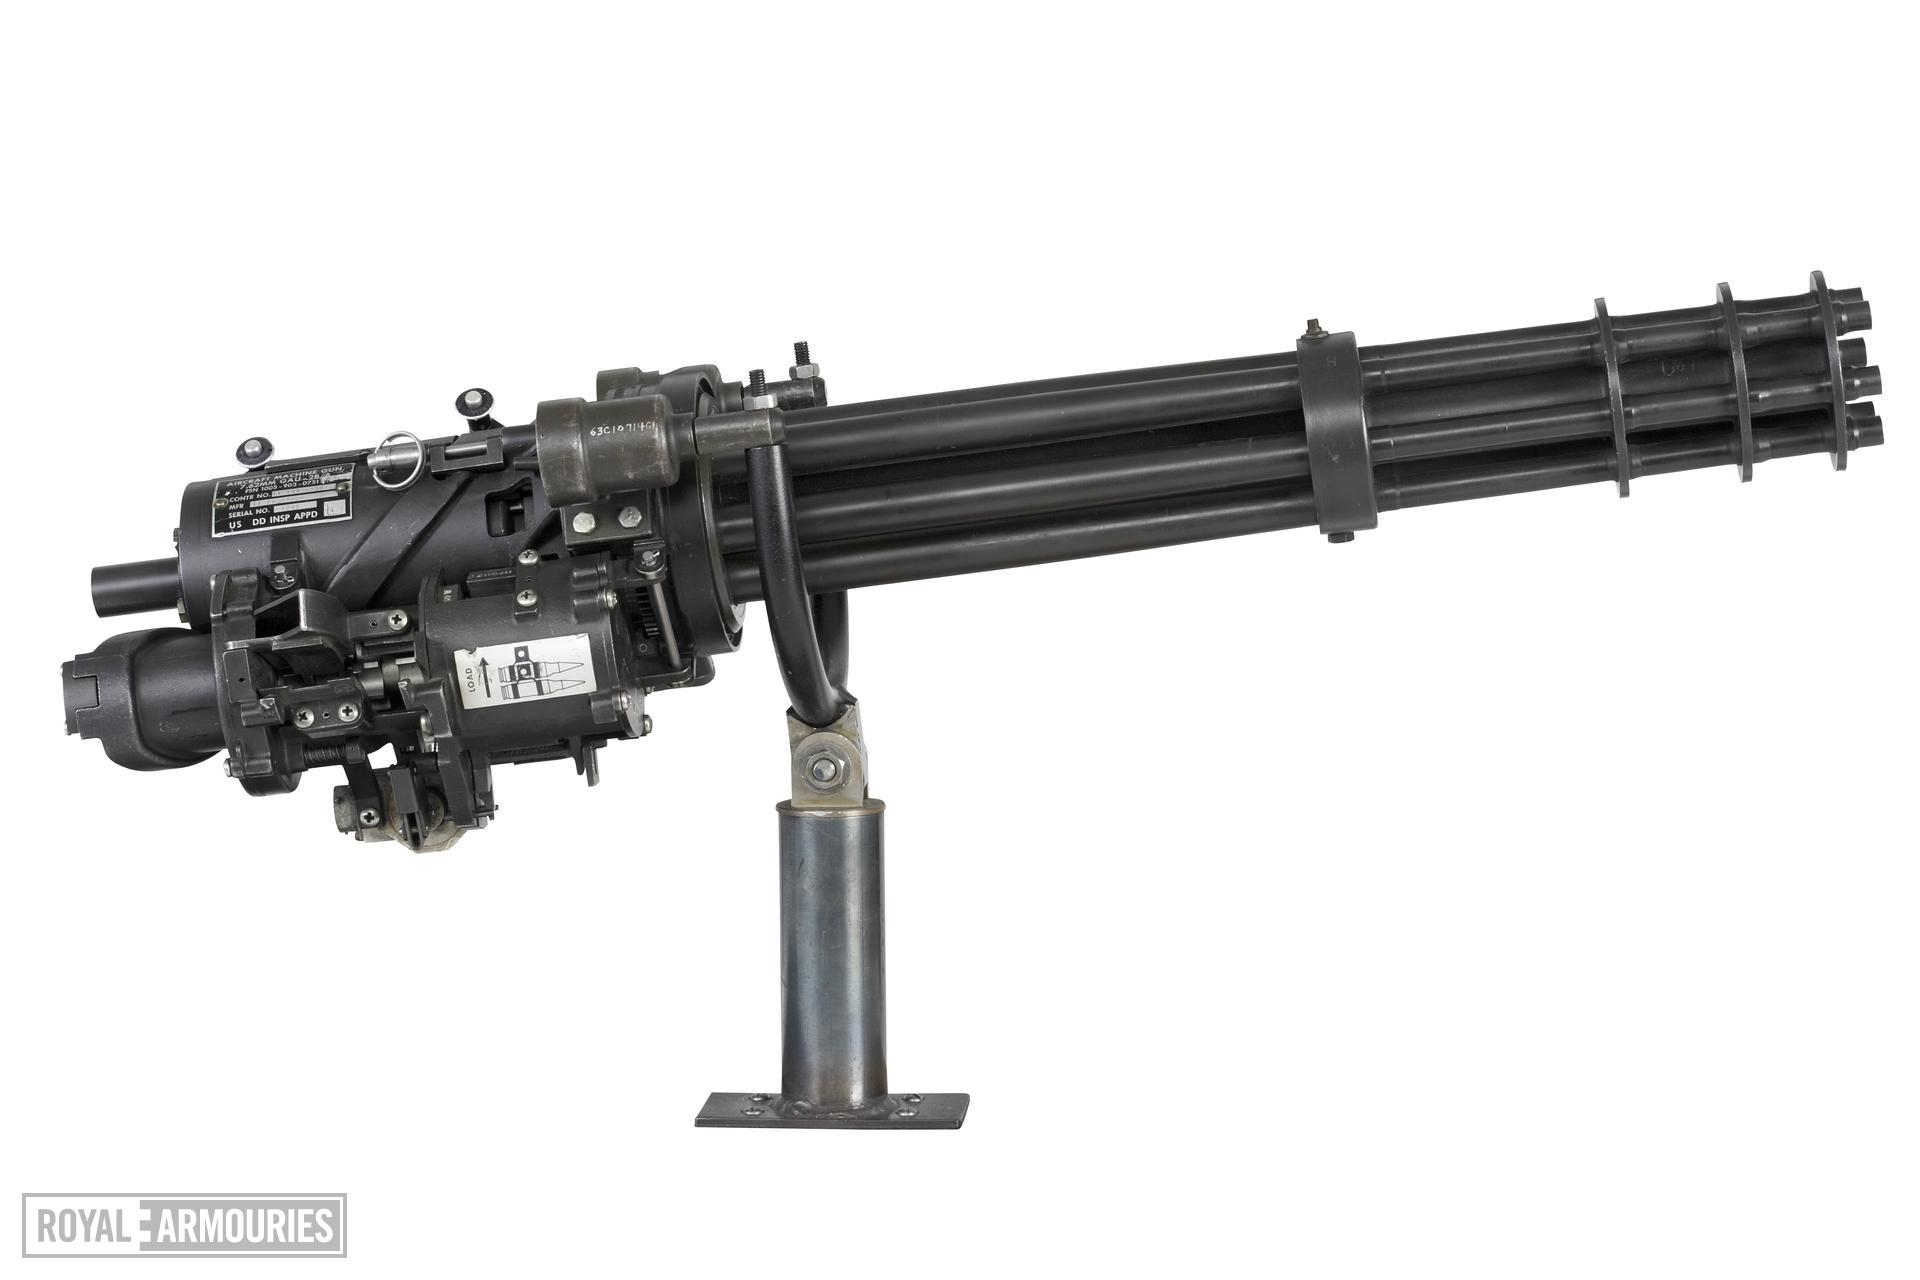 Centrefire automatic machine gun - GEC M134, GAU 2B/A